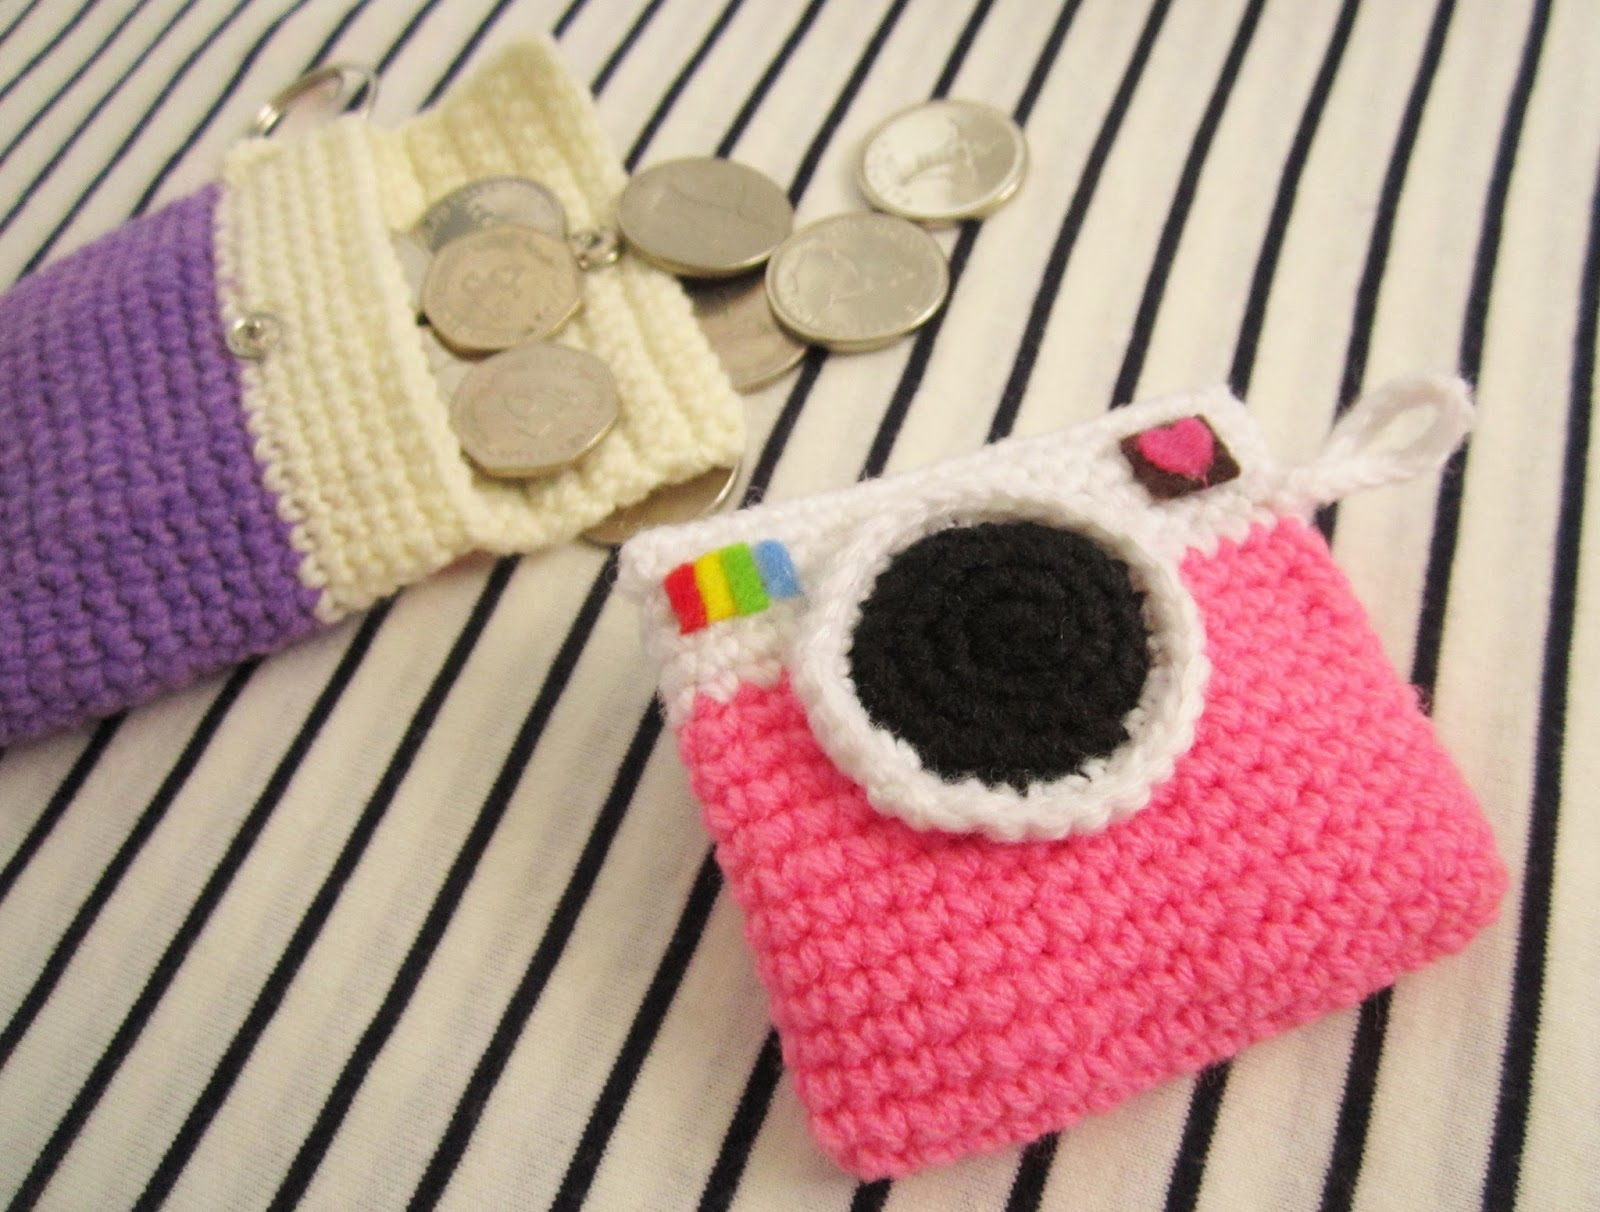 Camera coin purse crochet pattern - A little love everyday!